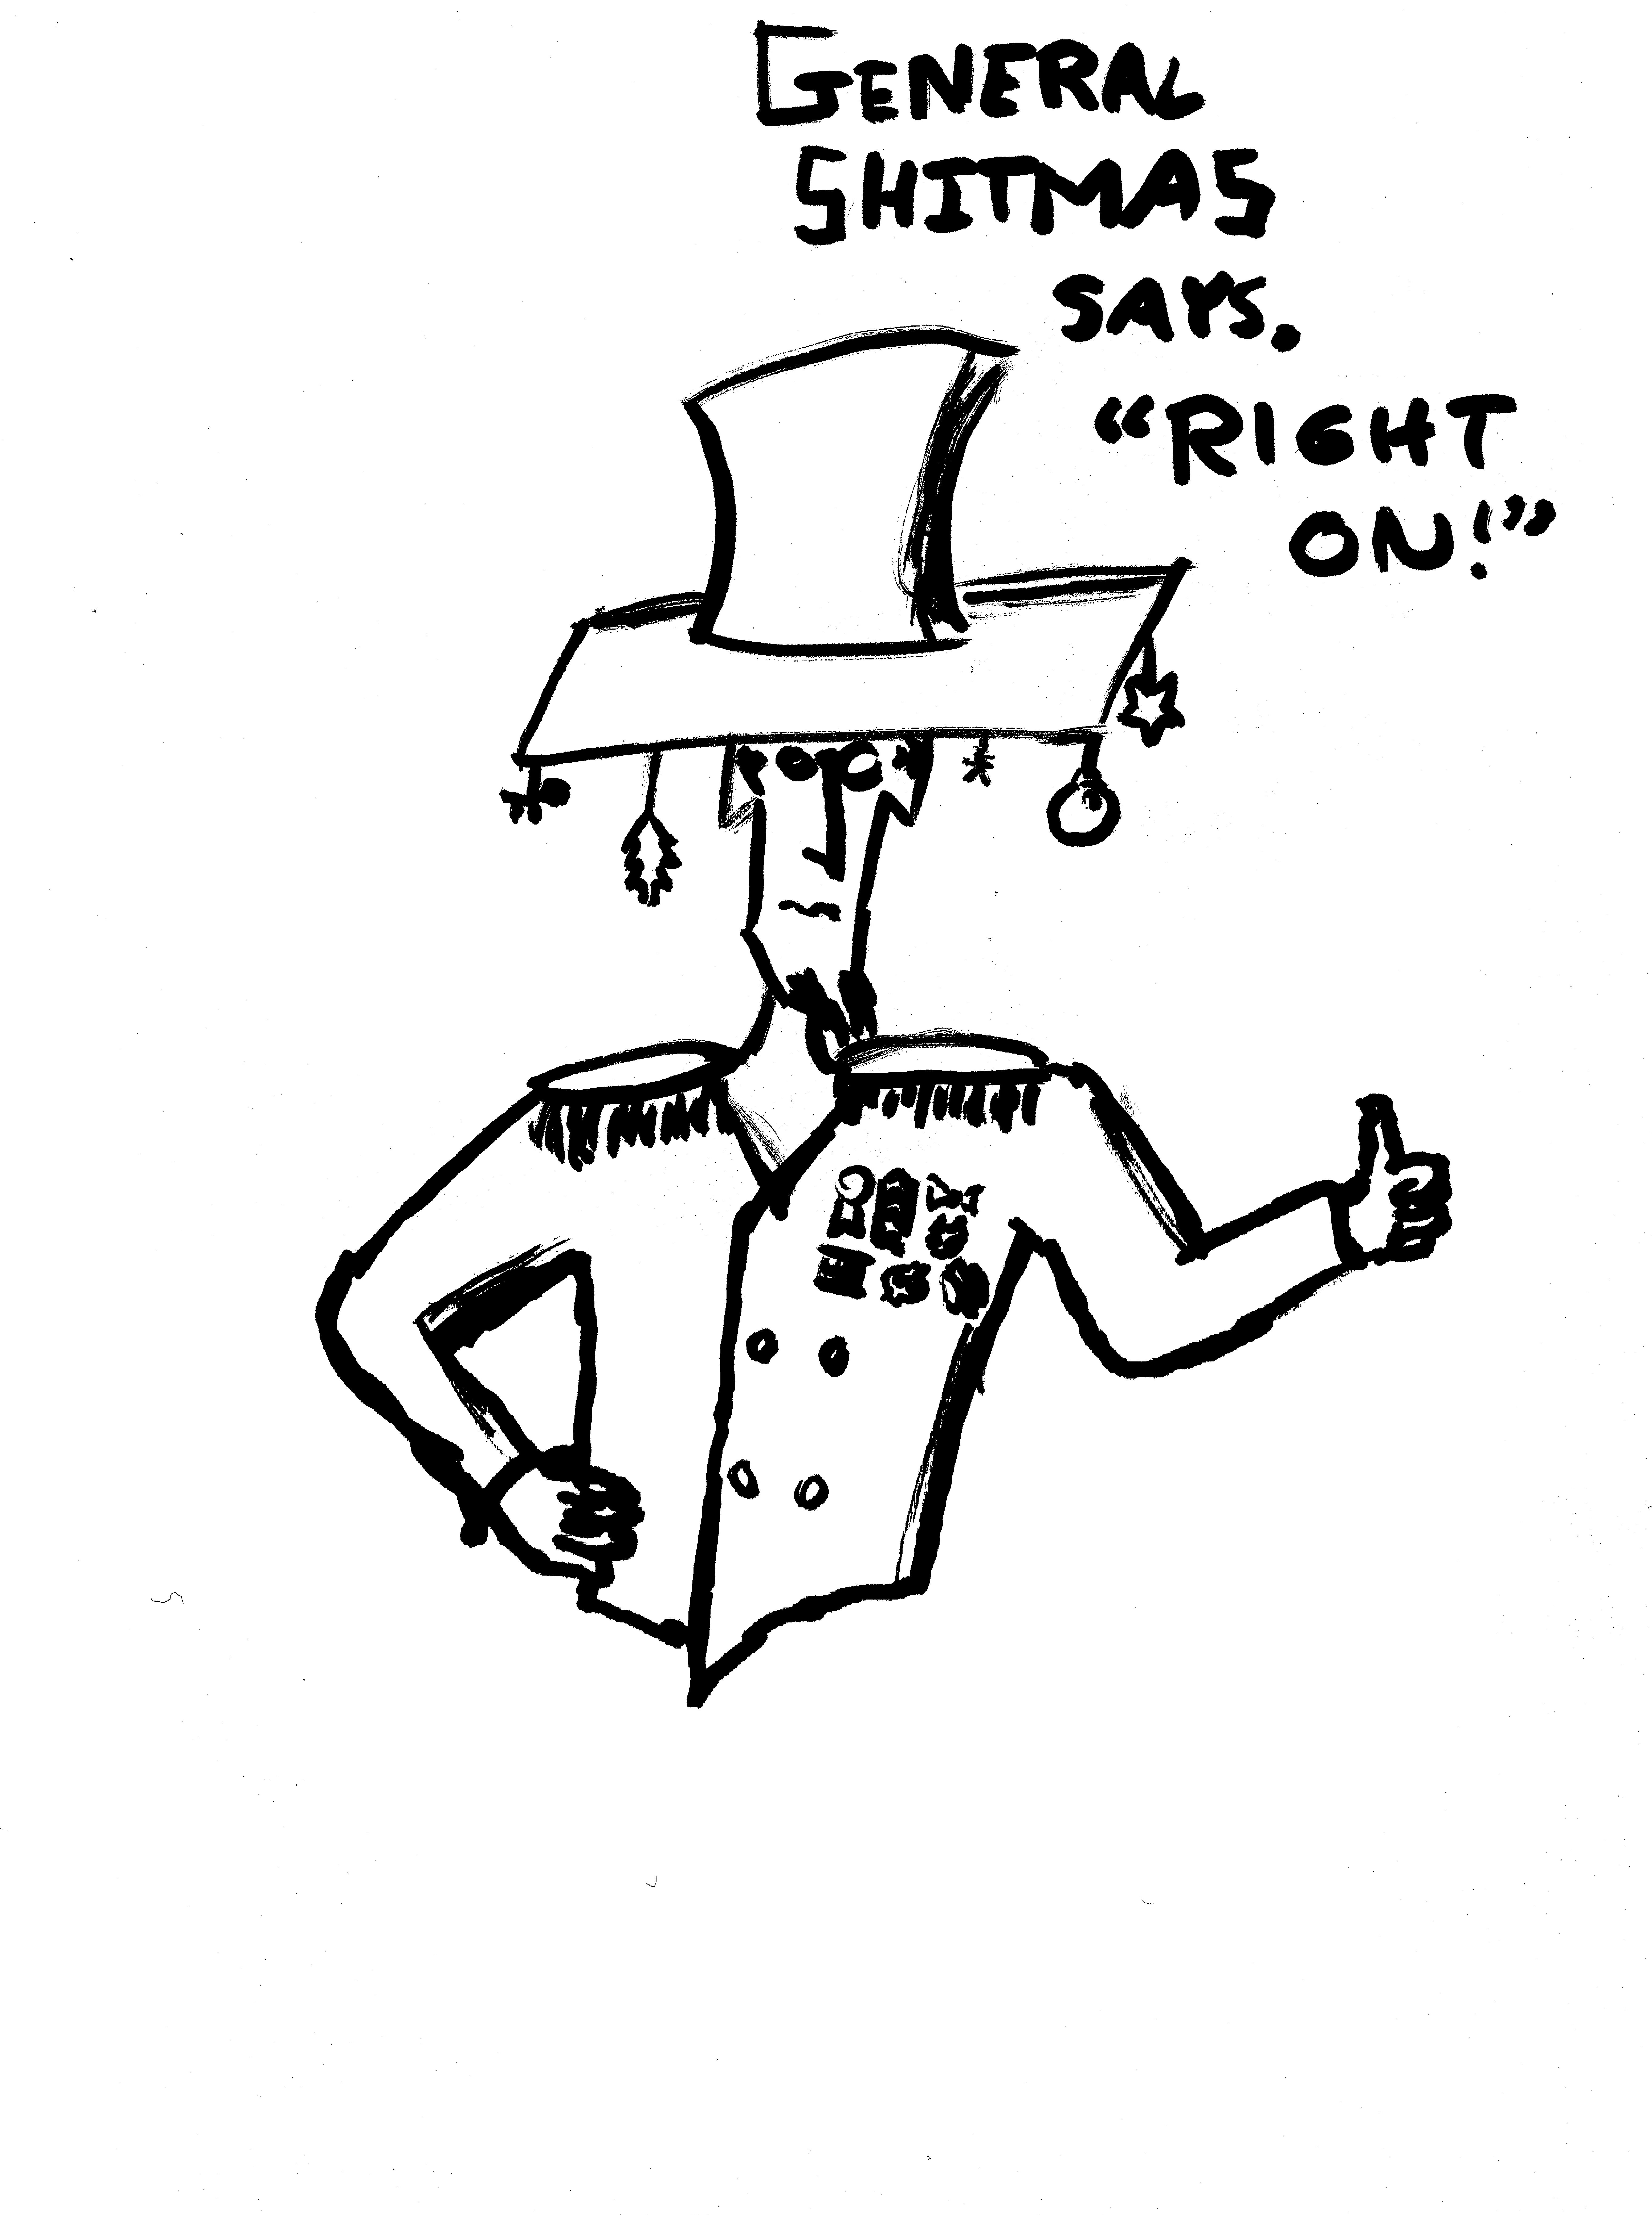 General_Shitmas